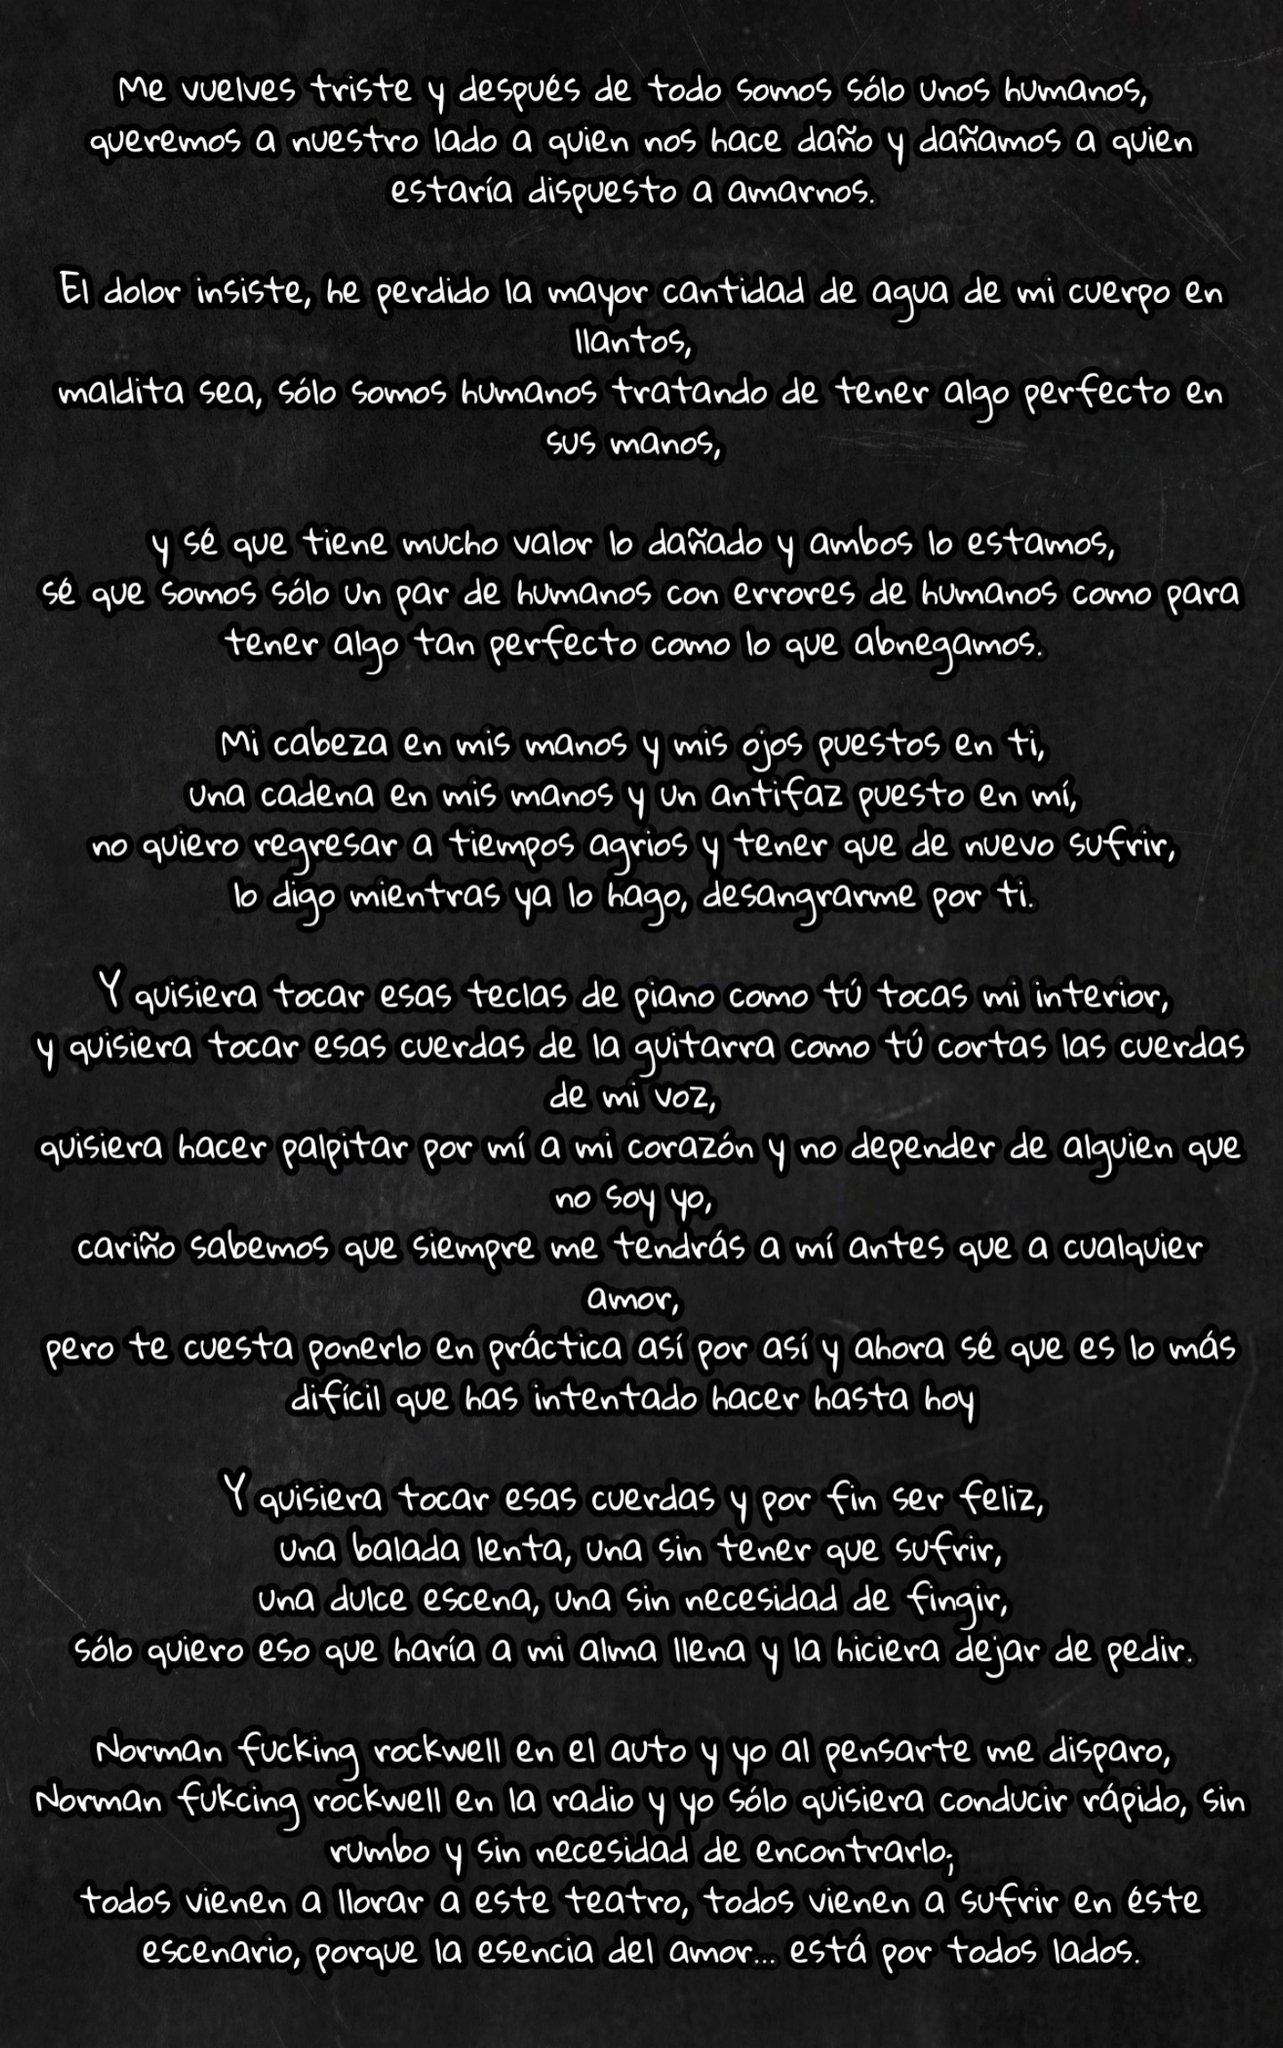 Elihu Búcaro On Twitter Poema Esencia Del Amor Poesia Poemas